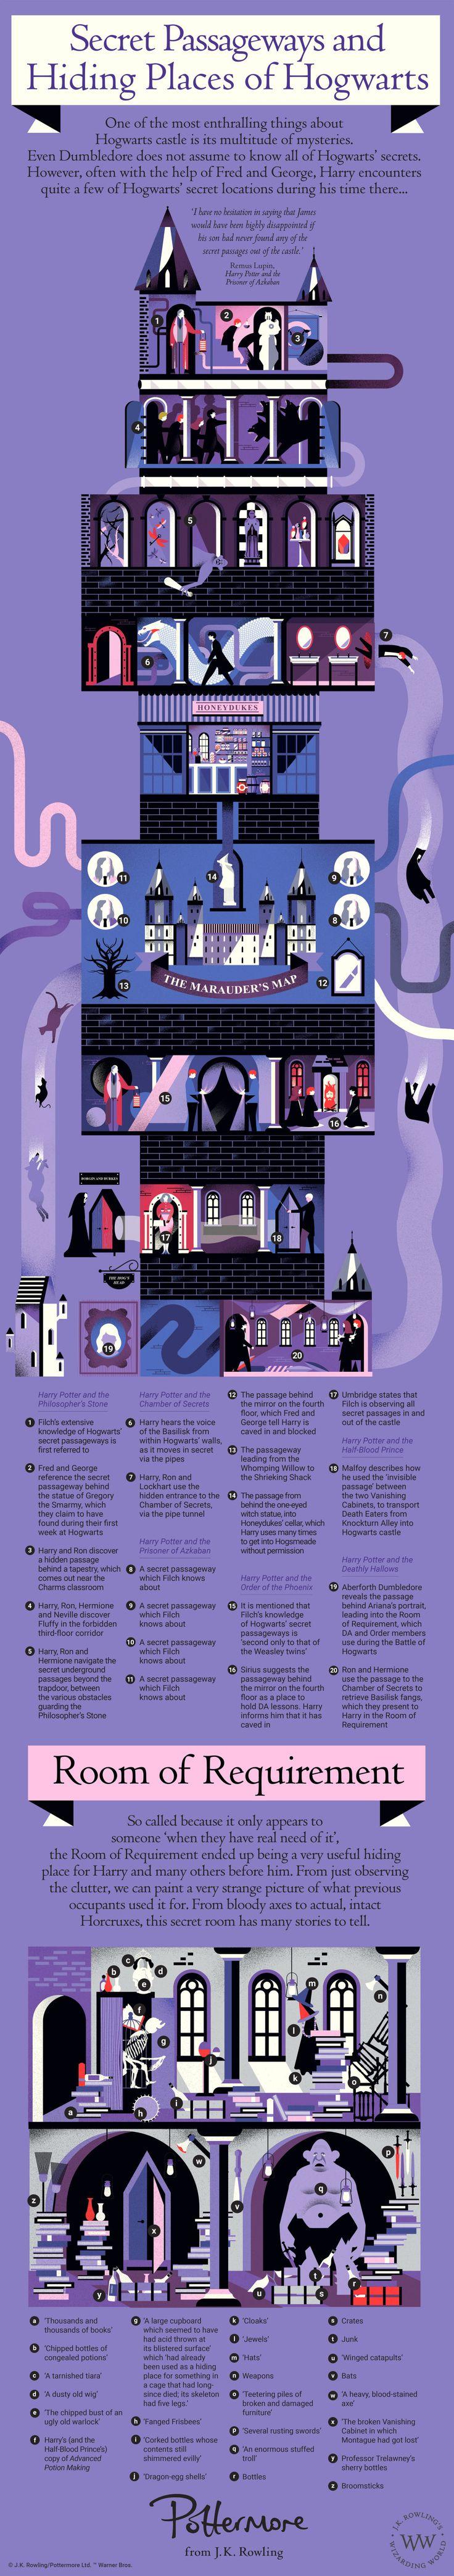 Secret Passageways Infographic